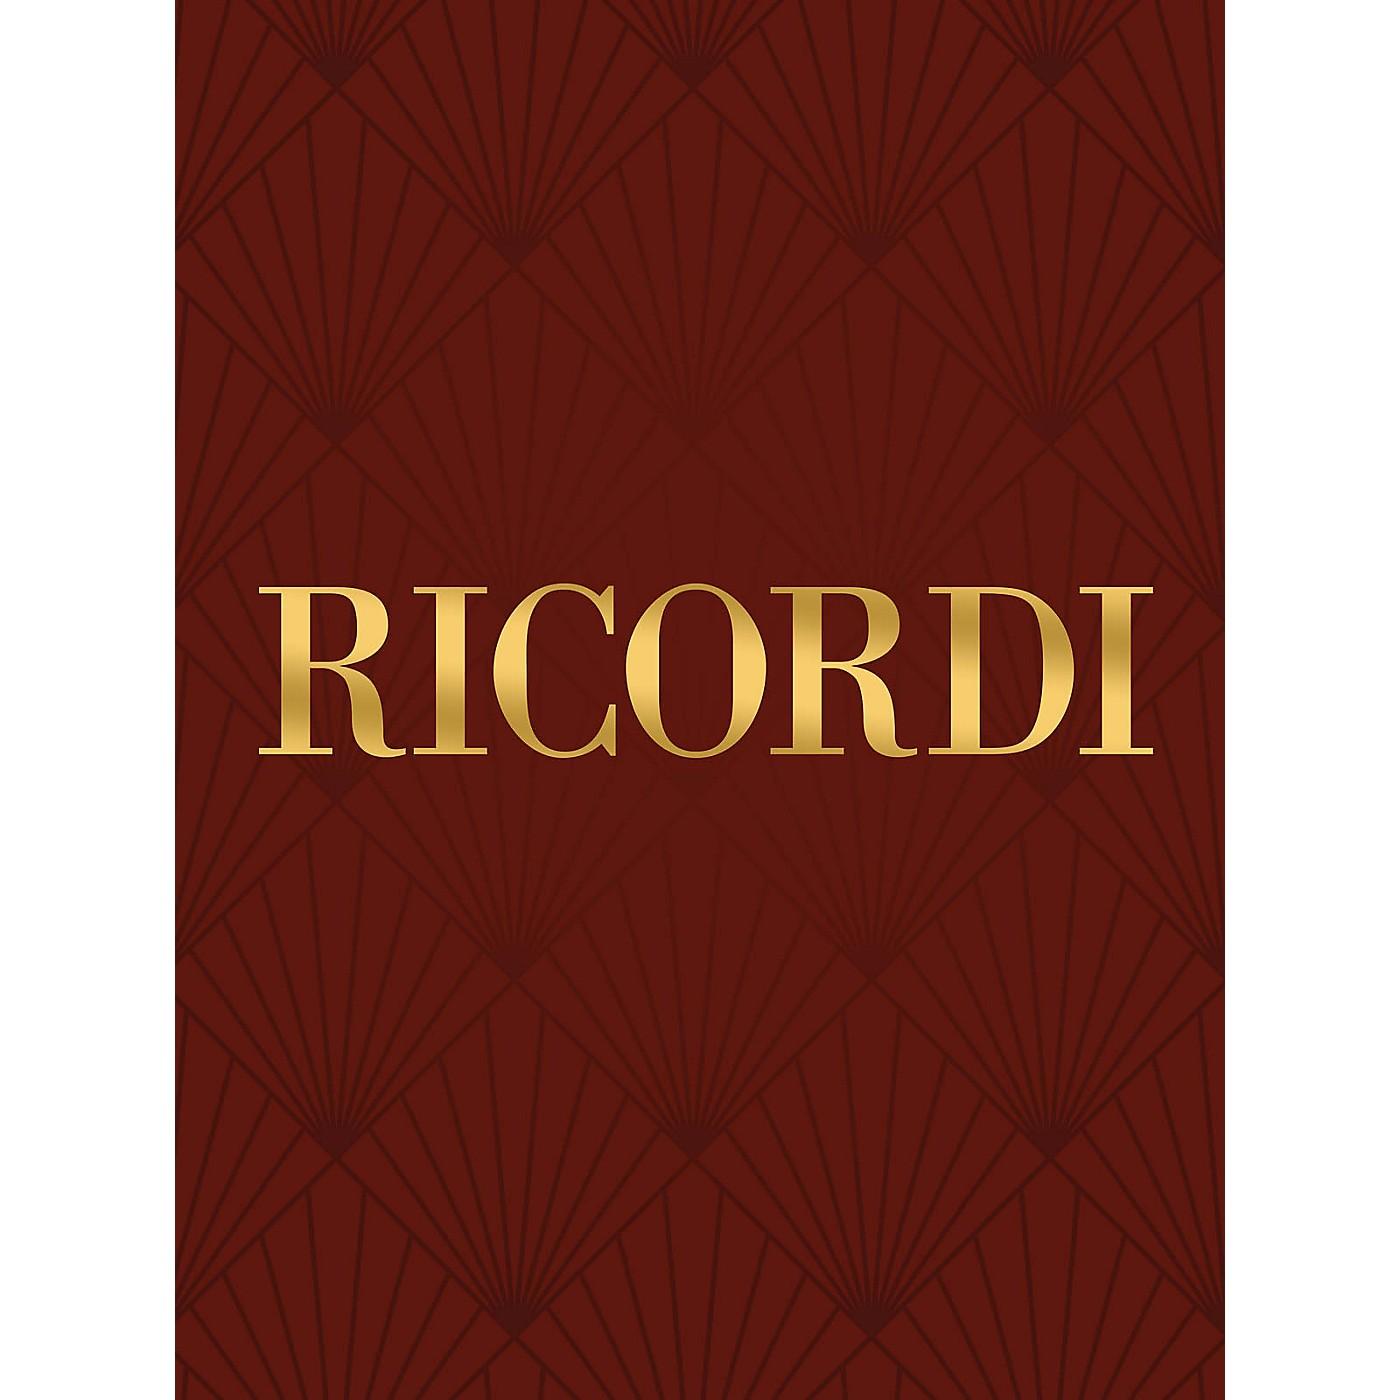 Ricordi Metodo Seguito (25 Studi) It/Fr/En String Method Series Composed by B. Bruni Edited by Consolini thumbnail